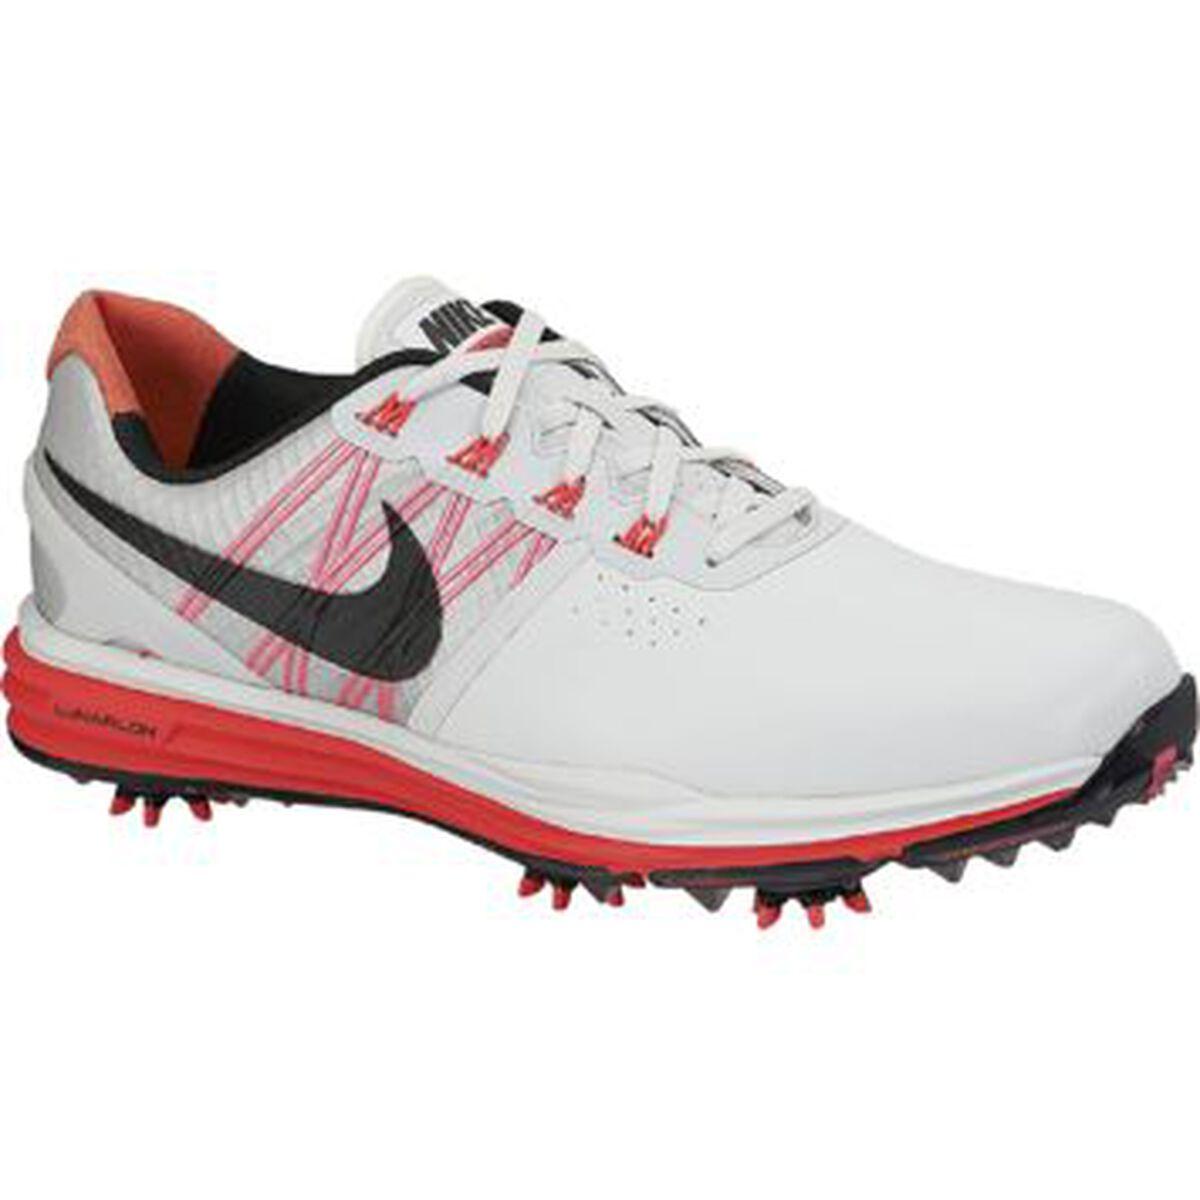 best loved ca202 3aa39 Nike Lunar Control III Men  39 s Golf Shoe - Grey Red Zoom Image